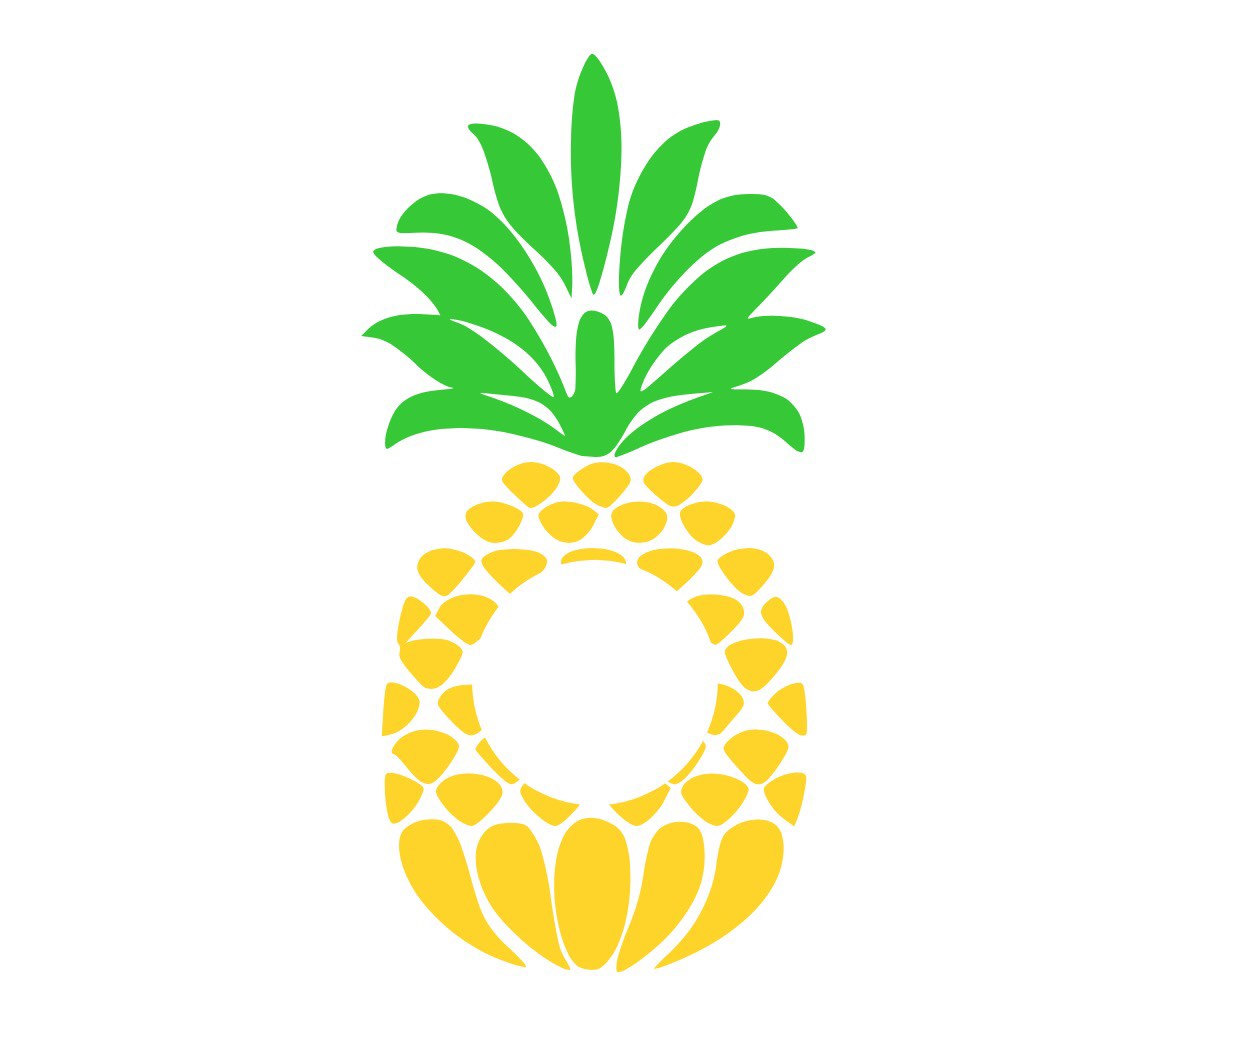 Pineapple monogram clipart png Pineapple Monogram Clipart png